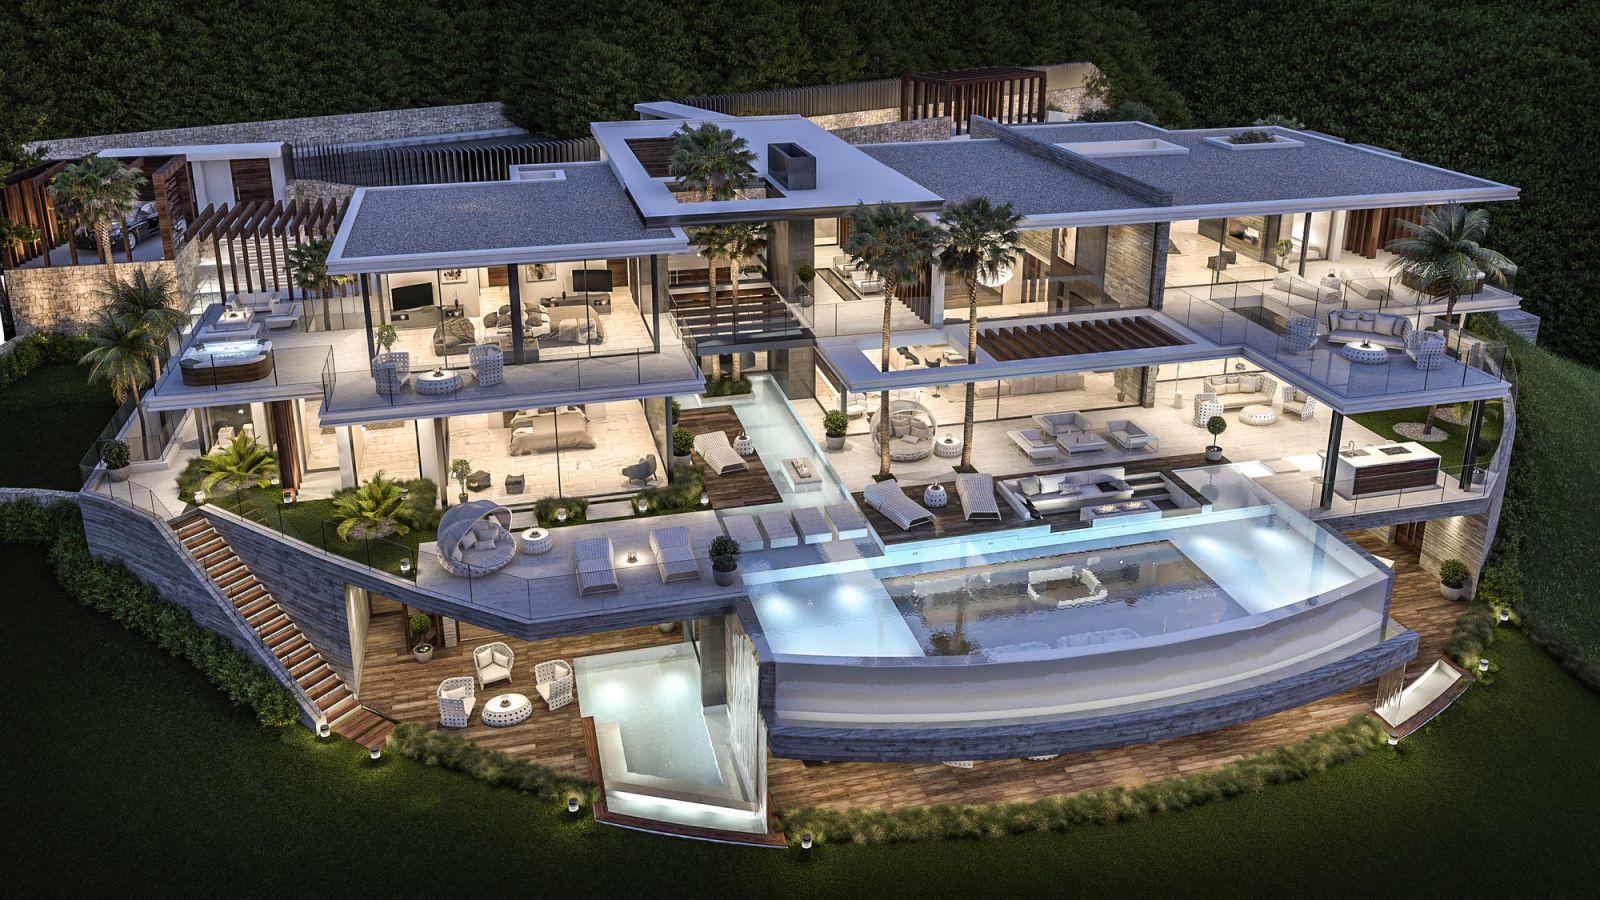 New Modern Villas For Sale In Marbella